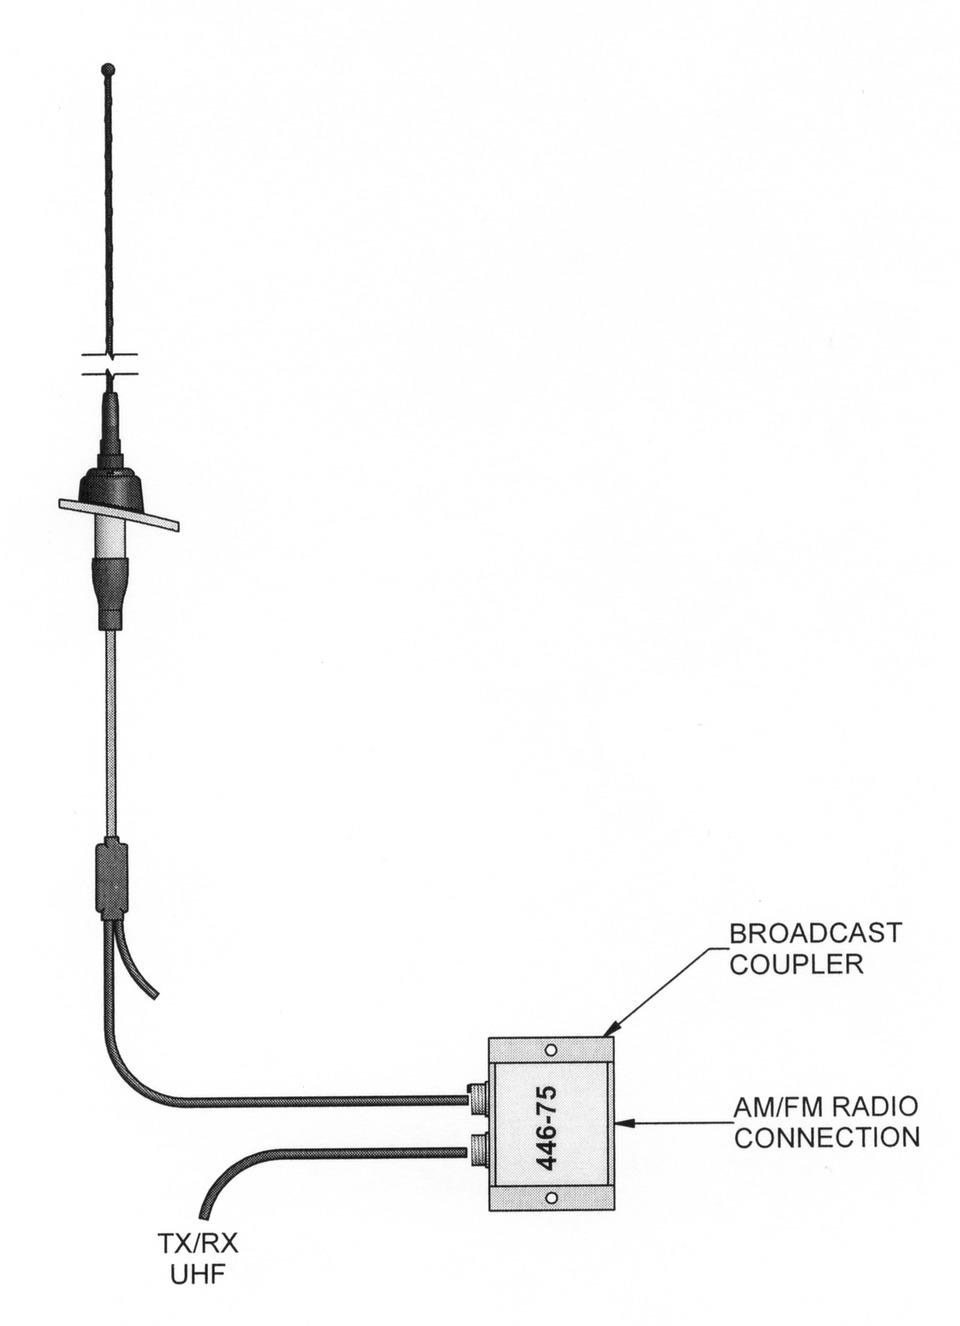 Comprod Inc. 136-174 MHz disguise AM/FM antennas in